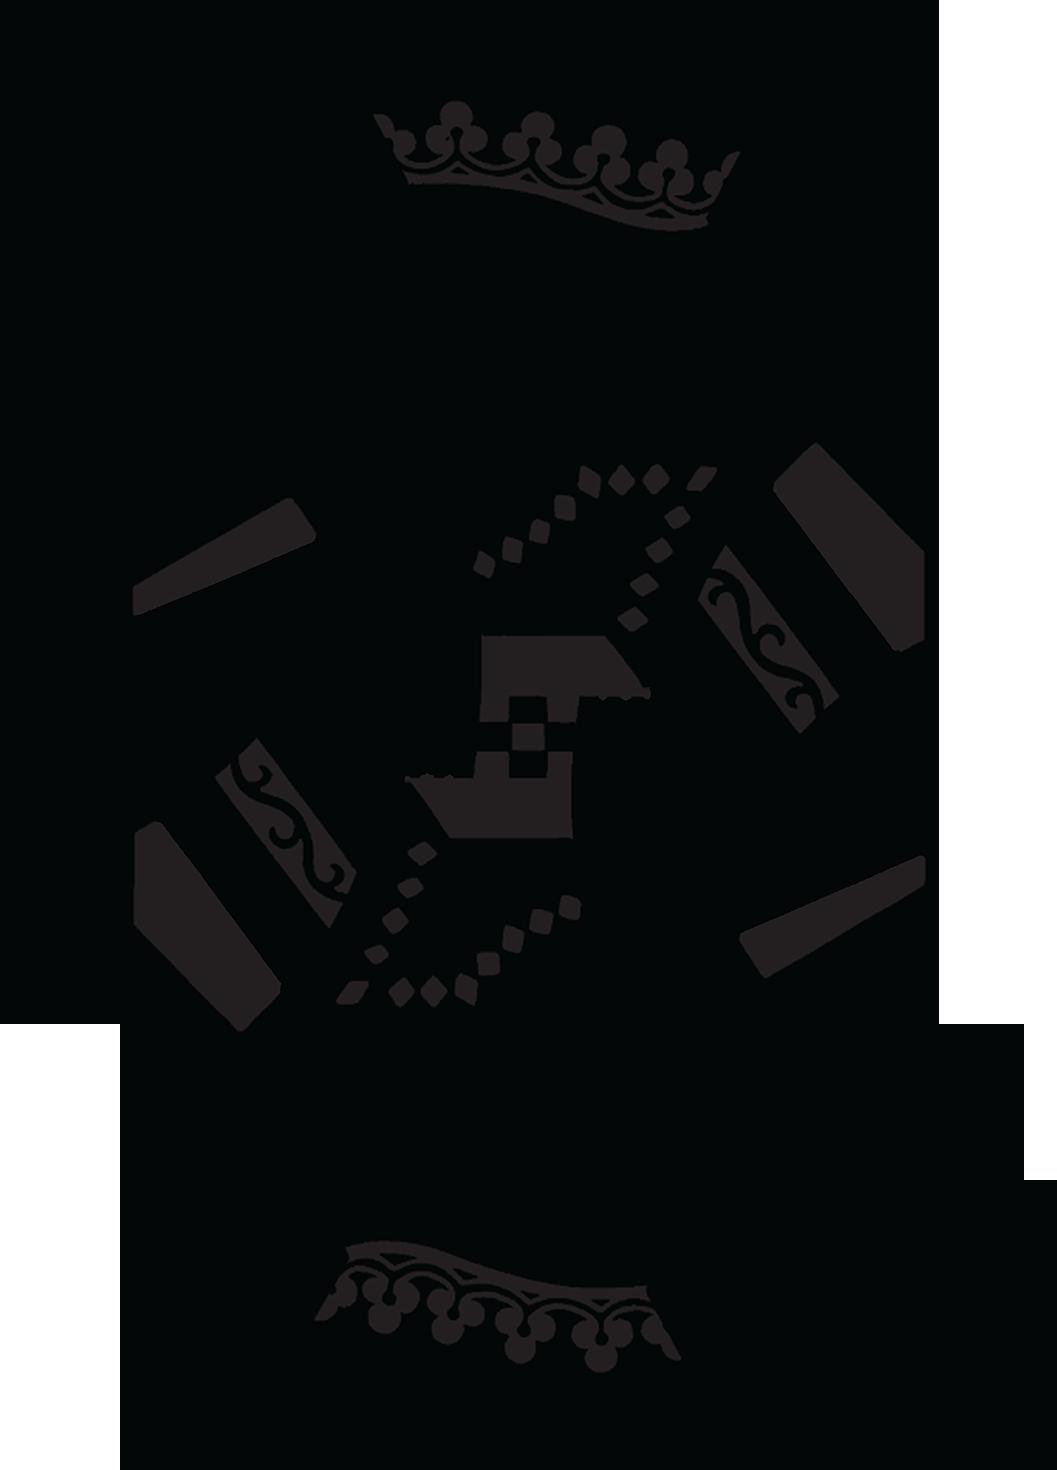 custom printed playing card red back  printbymagic  we